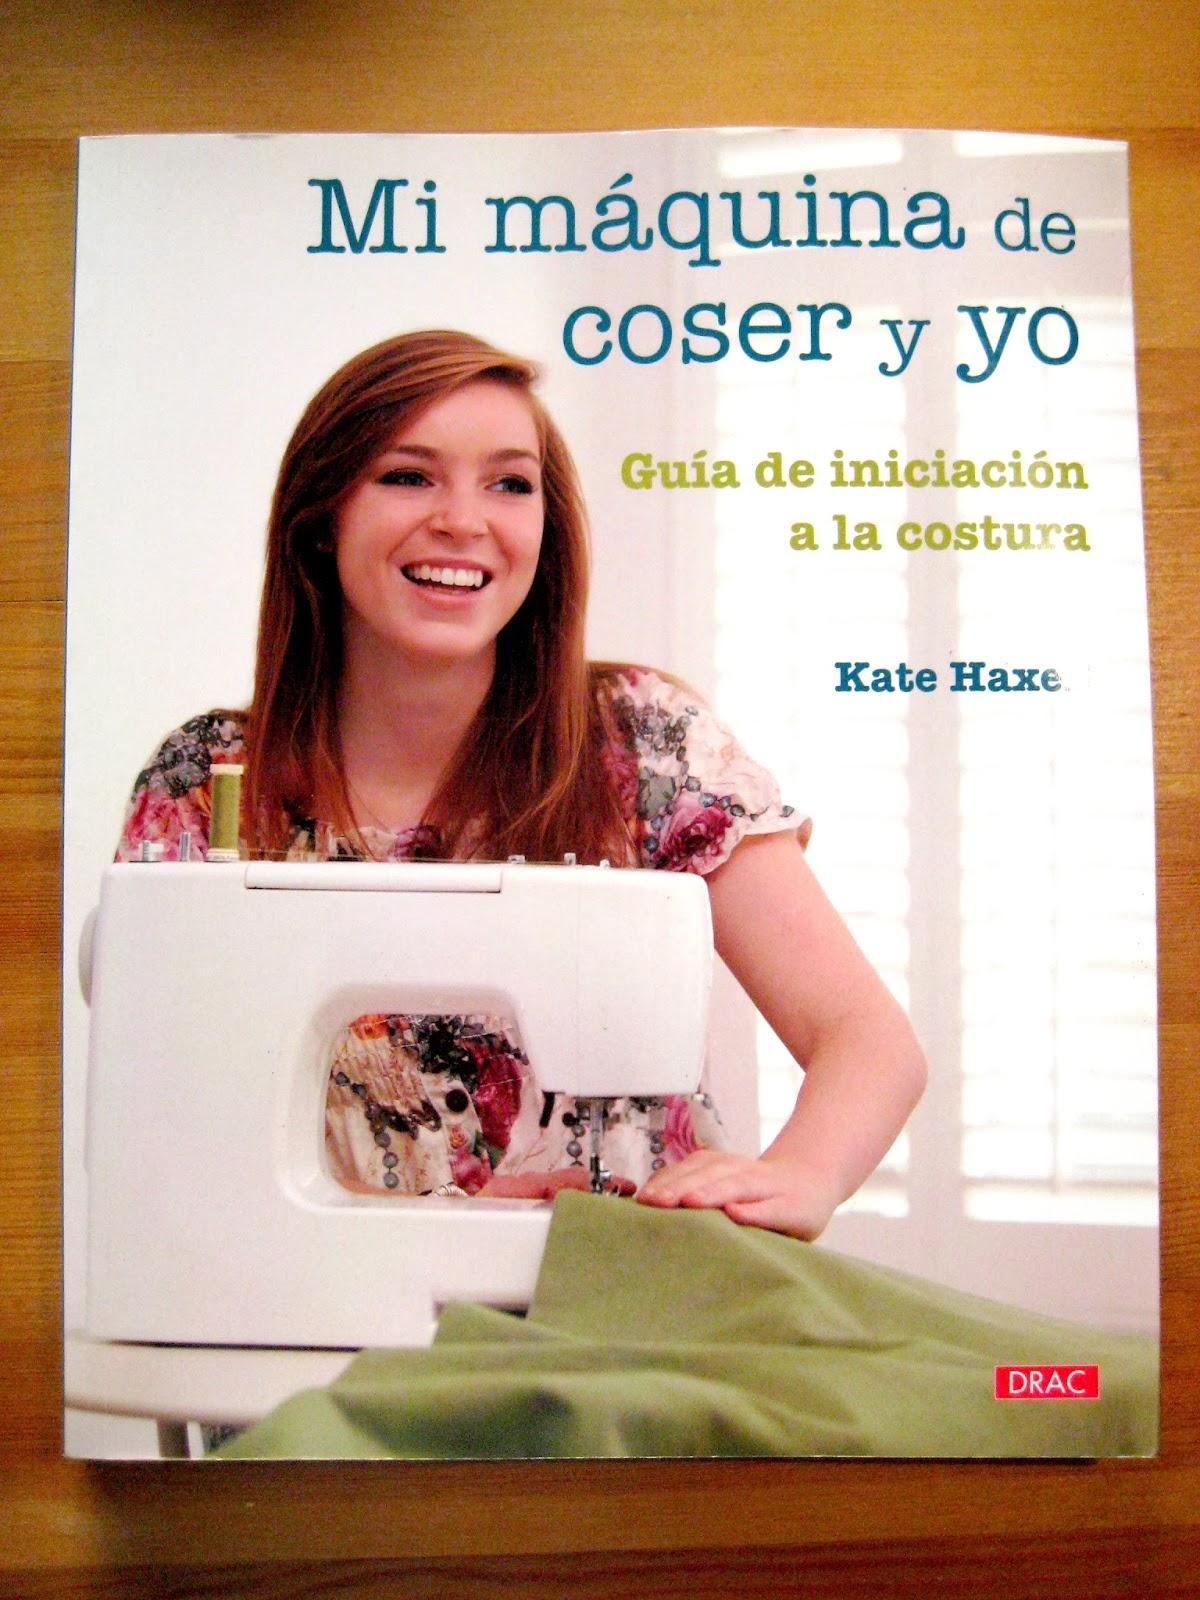 Alfamatic aprende a coser: Libros de costura